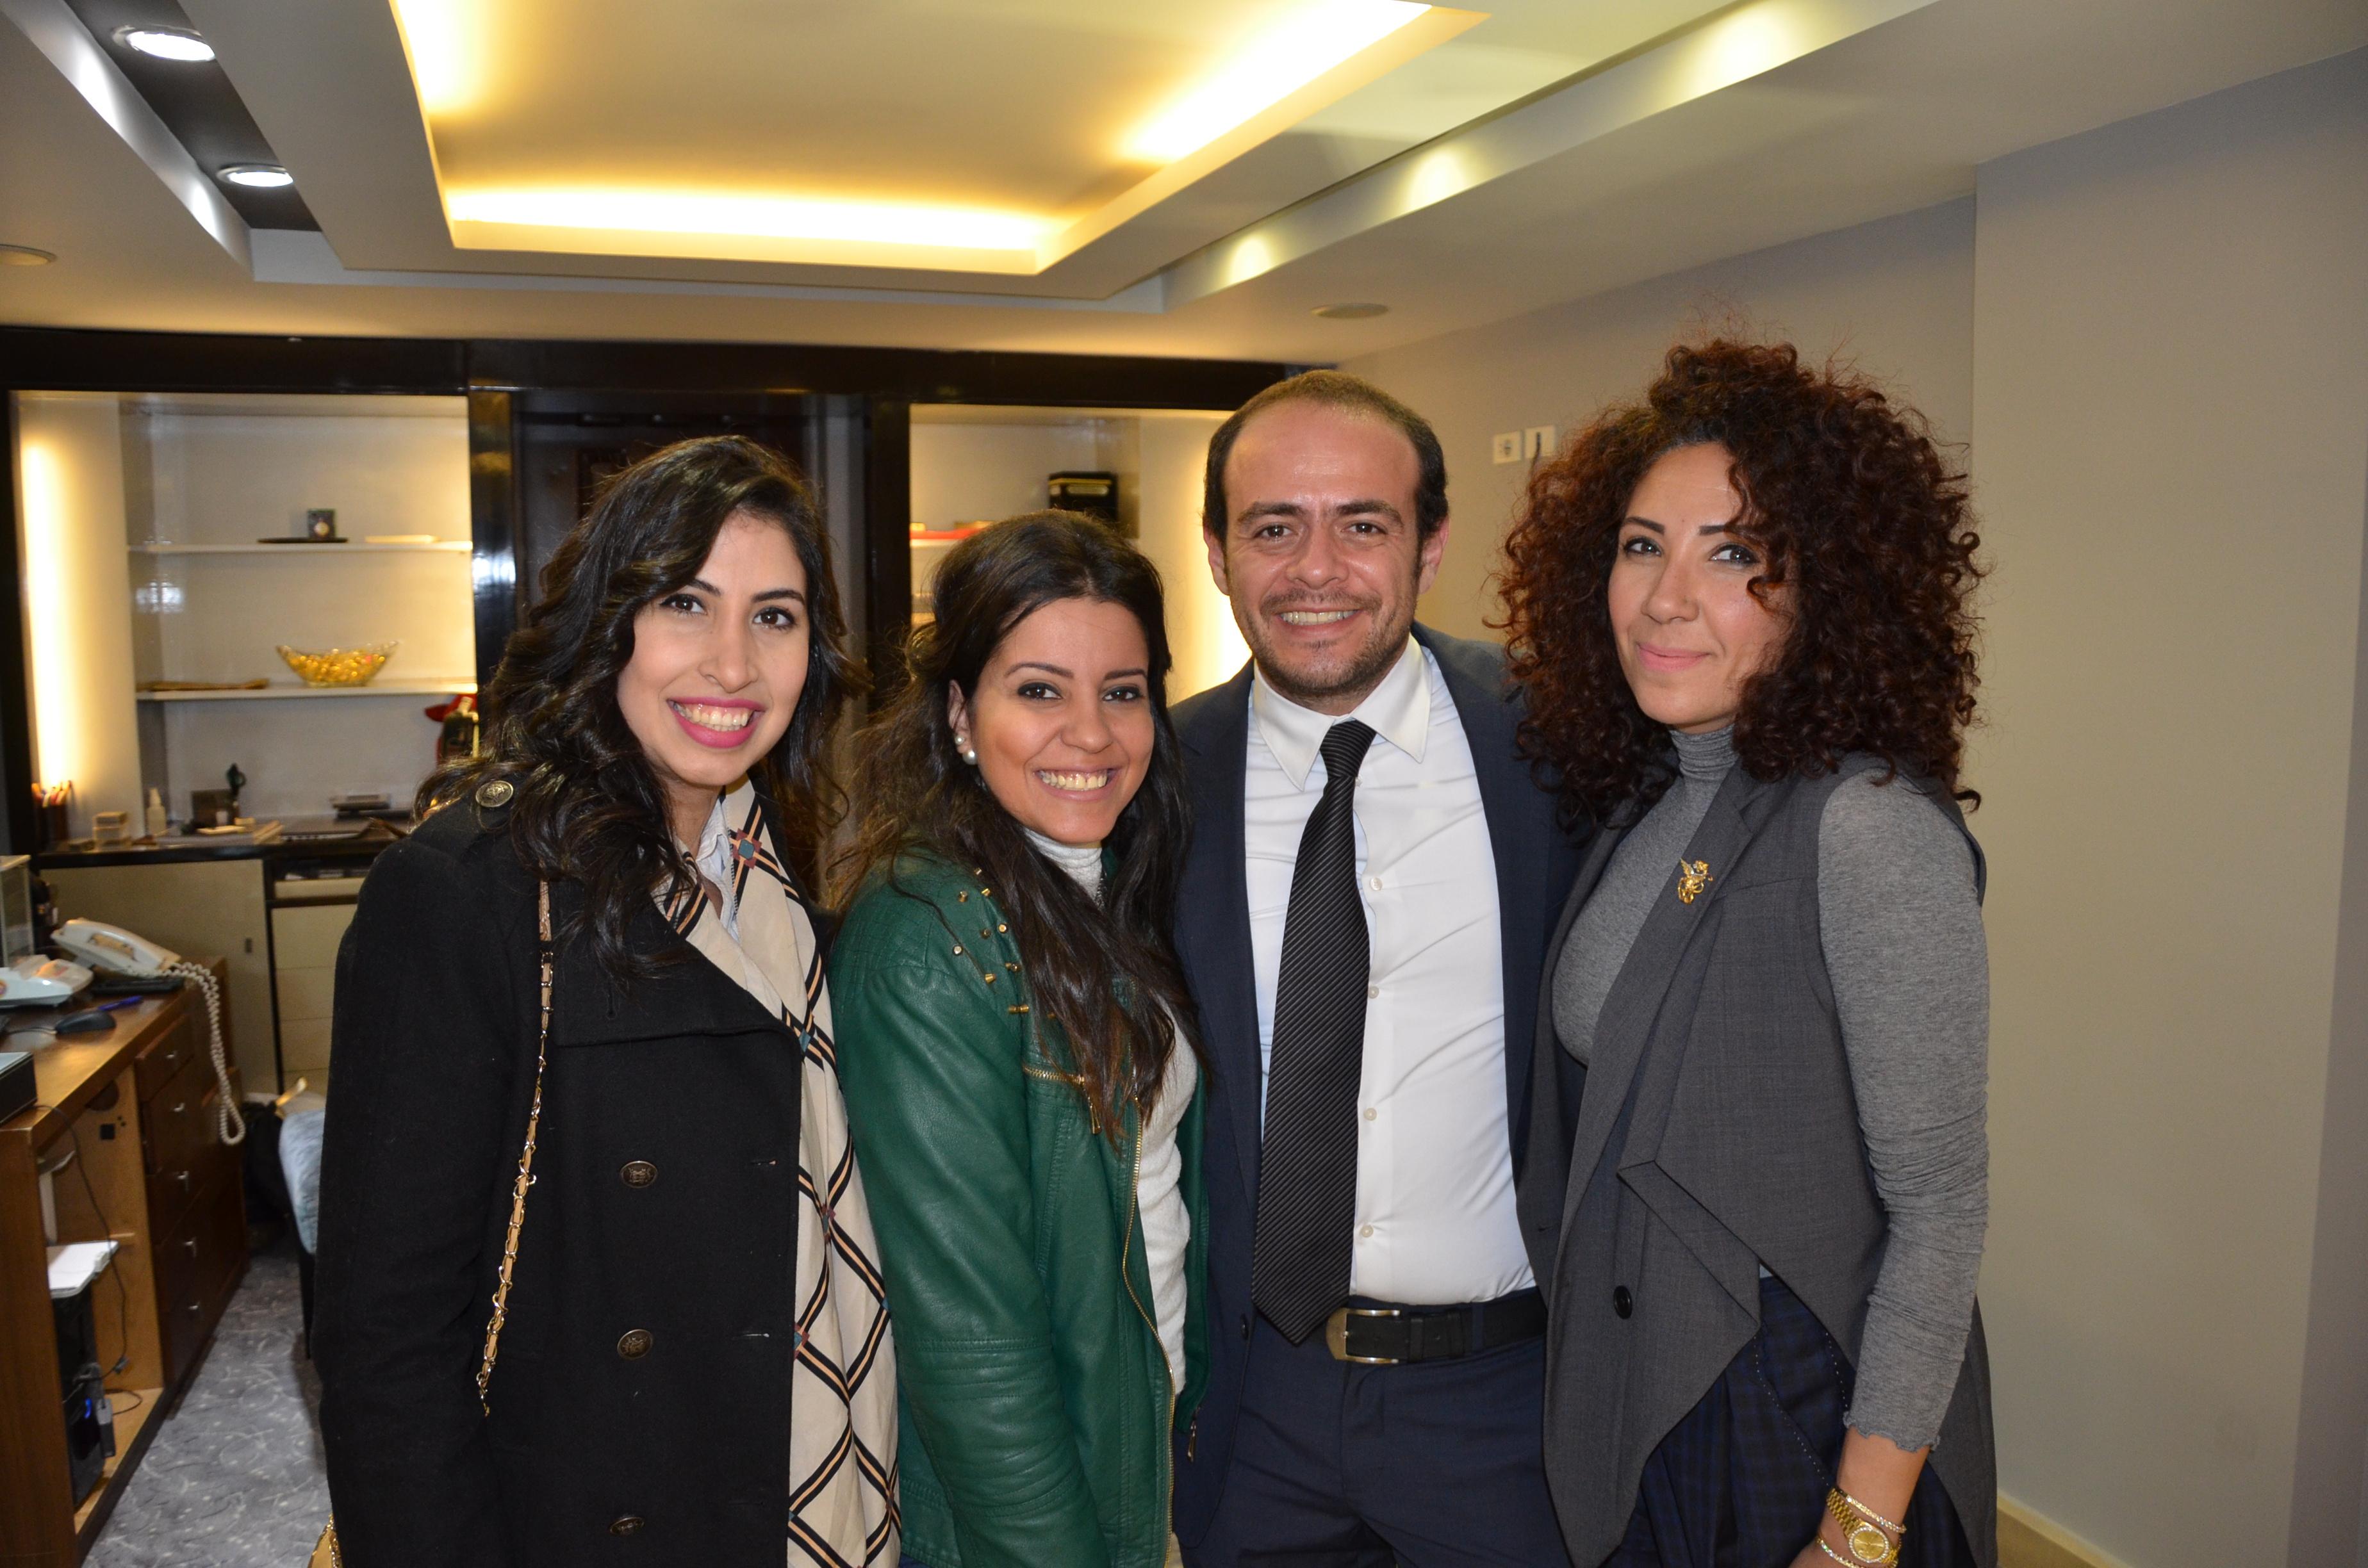 Ms. Passant Adel, Ms. Amira El Tohamy, Mr. Mahmoud El Sirgany & Ms. Marwa El Sirgany